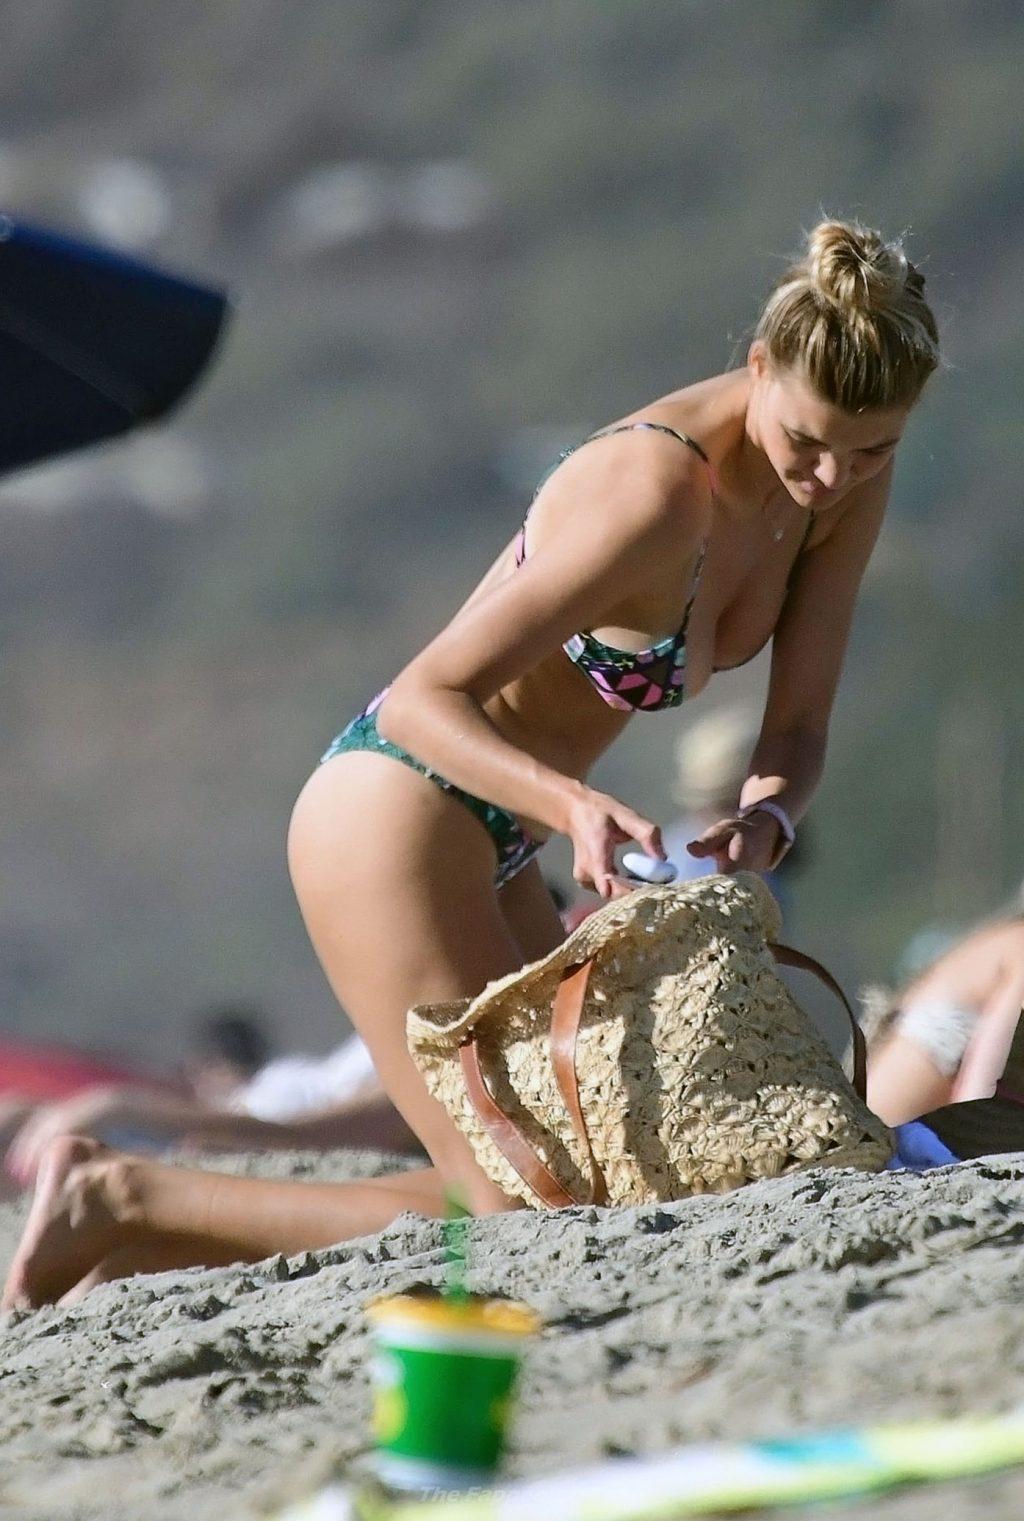 Kelly Rohrbach boobs